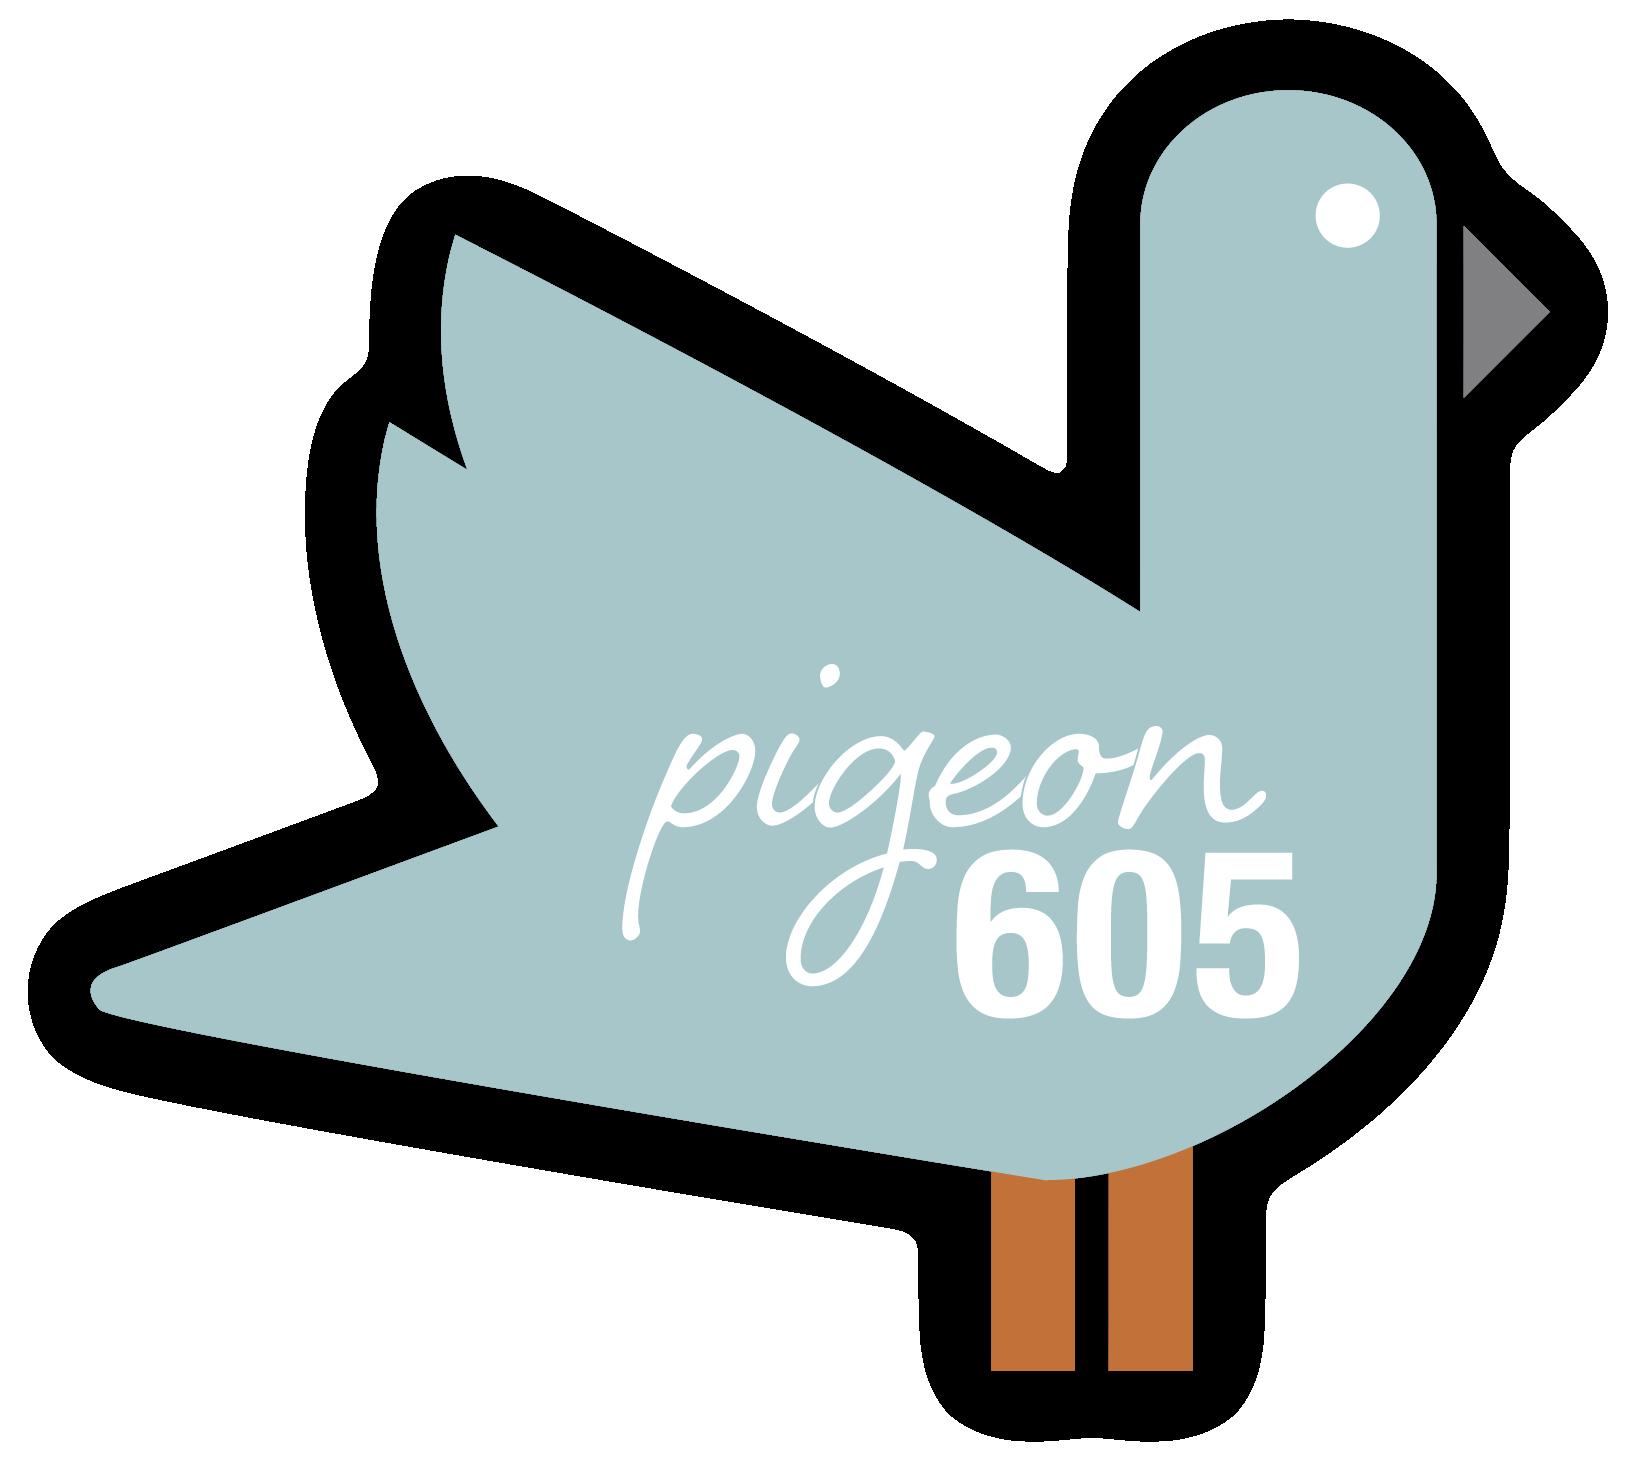 Pigeon 605 logo